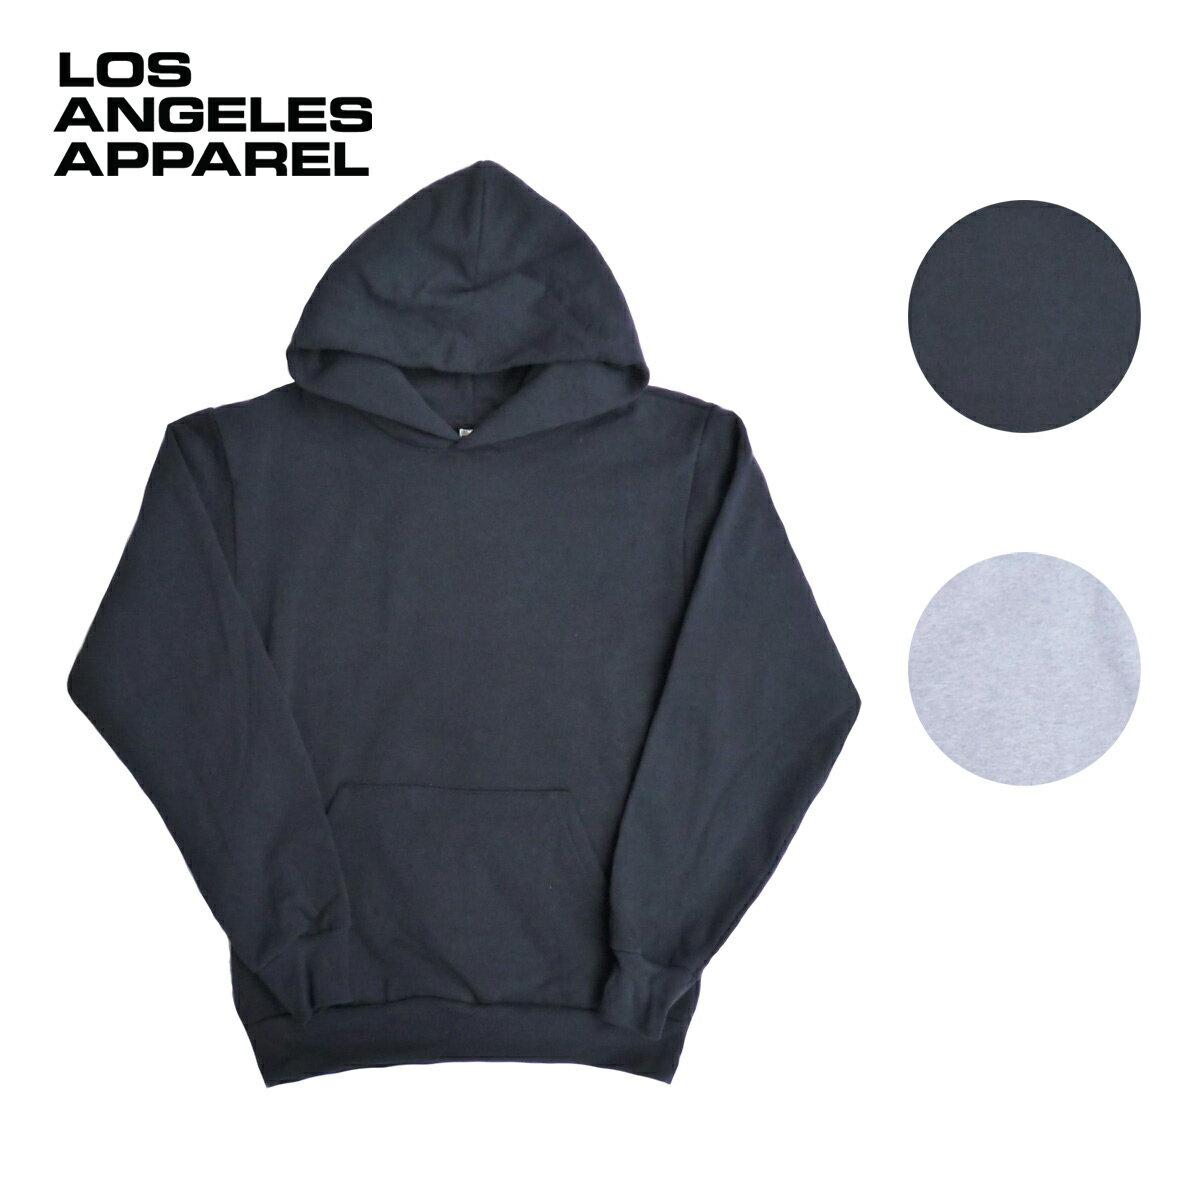 LOS ANGELES APPAREL ロサンゼルスアパレル 14oz SWEAT P/O HOODIE